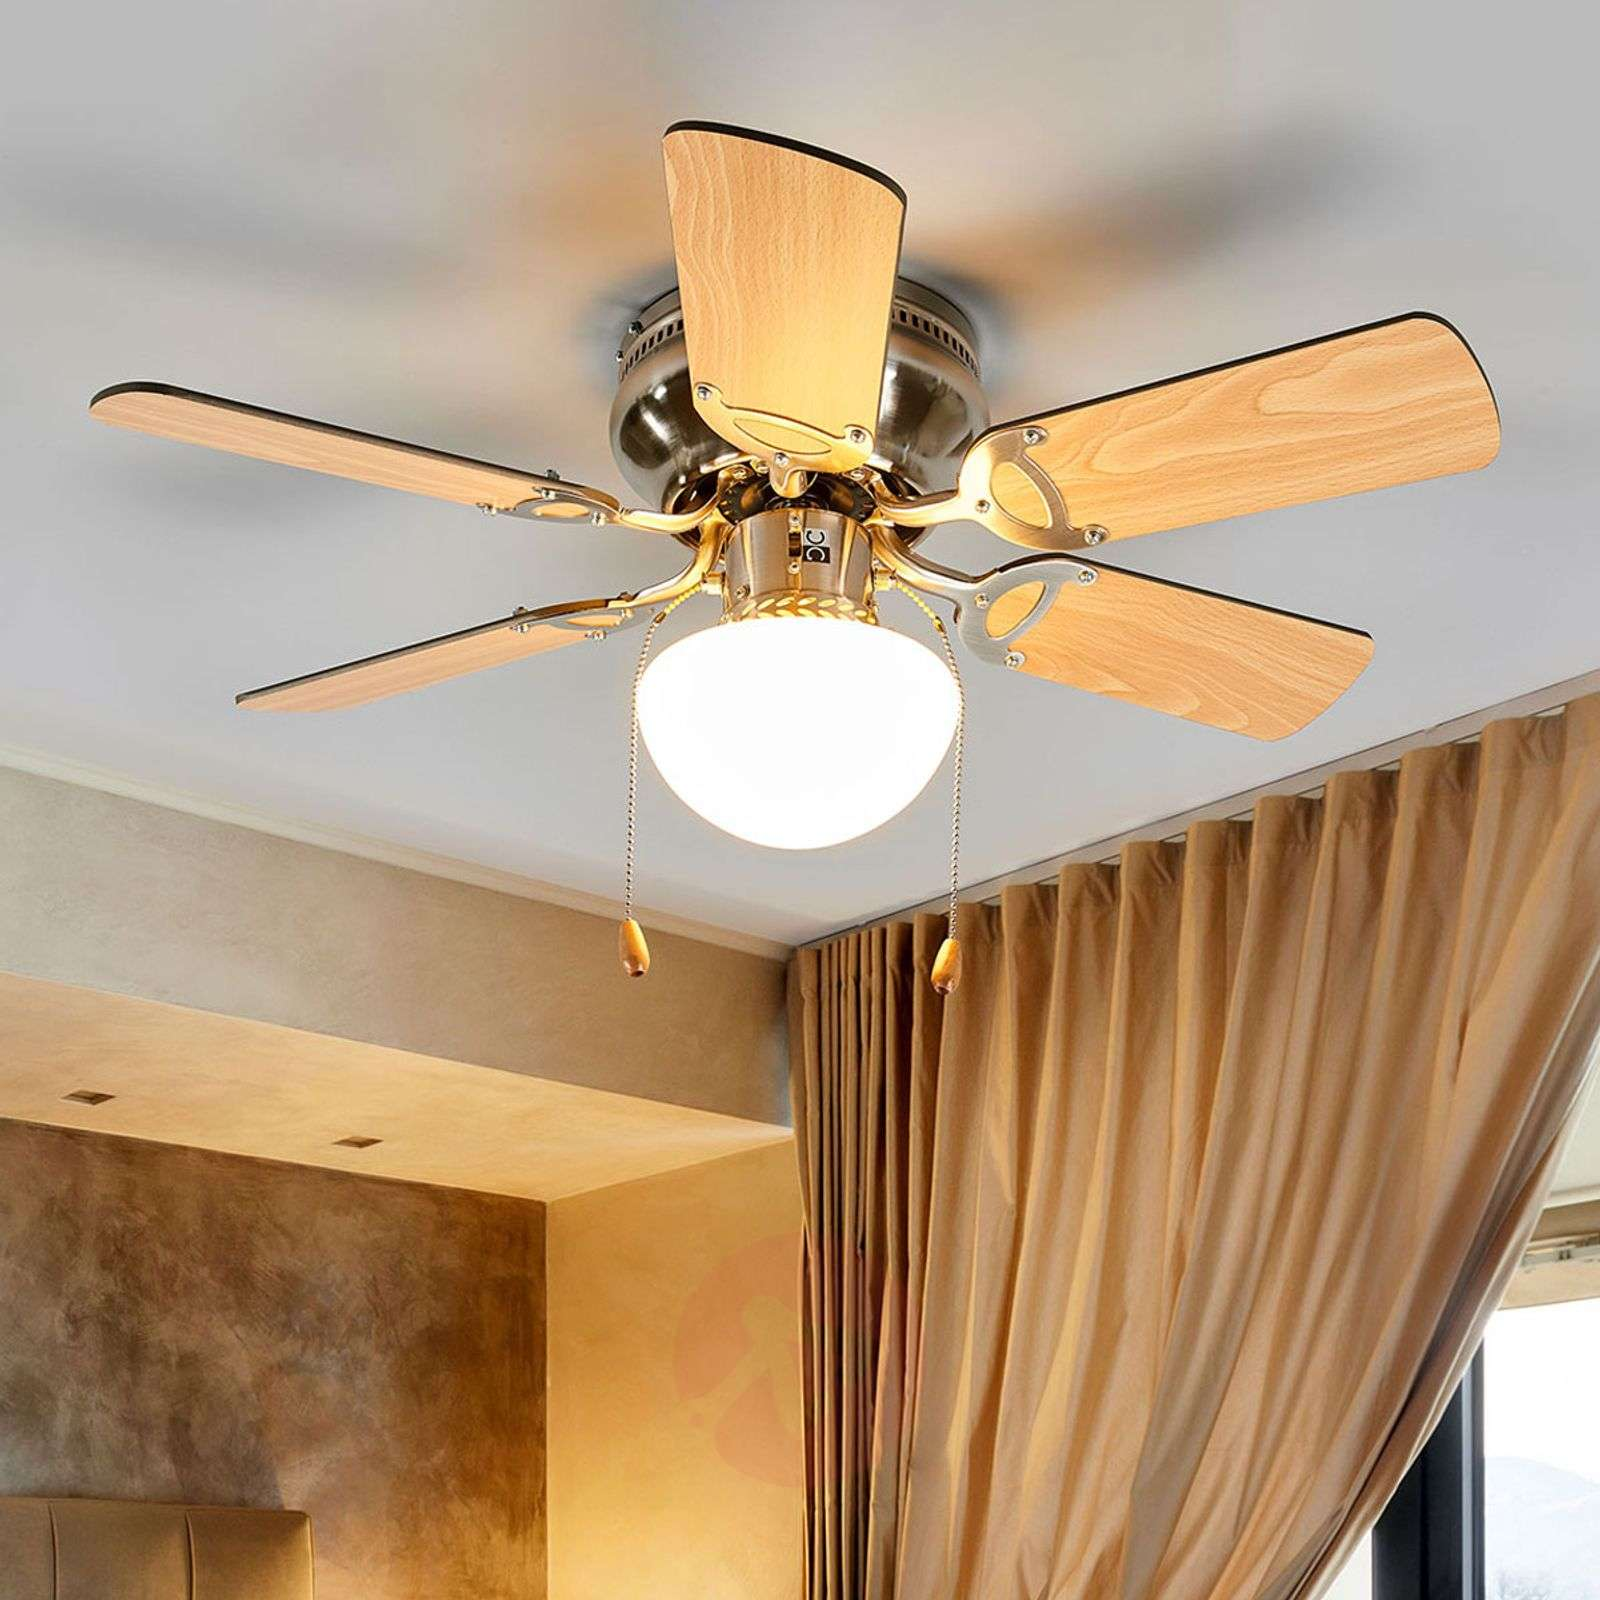 Flavio six-blade ceiling fan with light_4018095_1